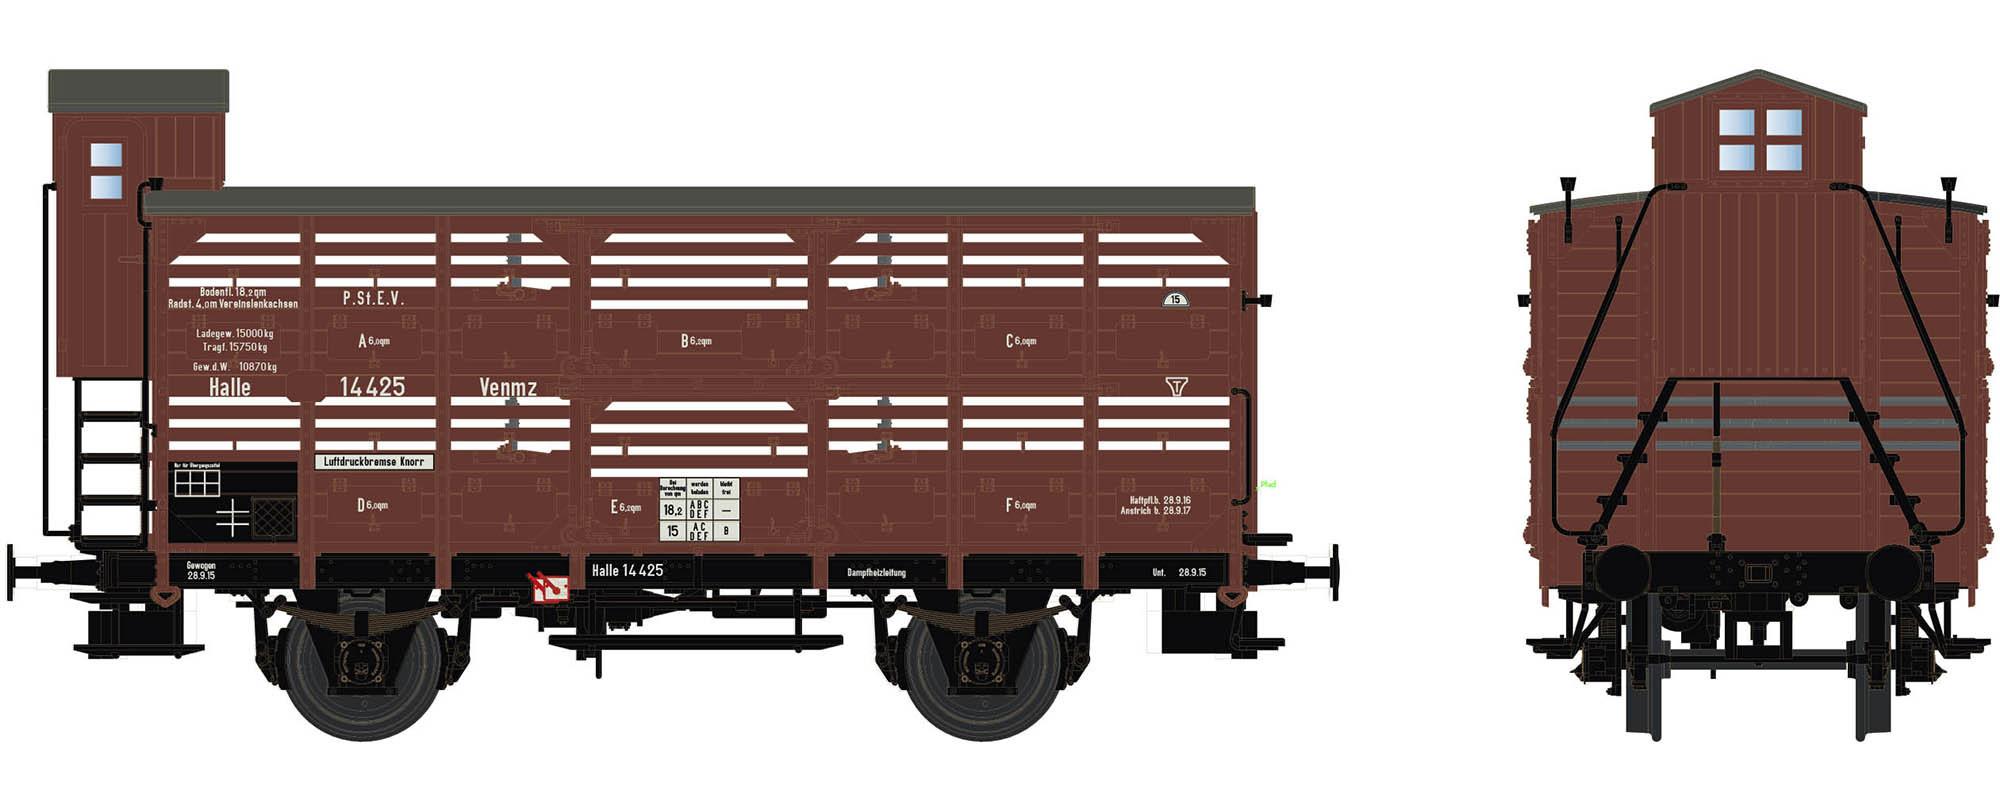 Wagenbausatz Verschlagwagen Vh14, P.St.E.V., Epoche I